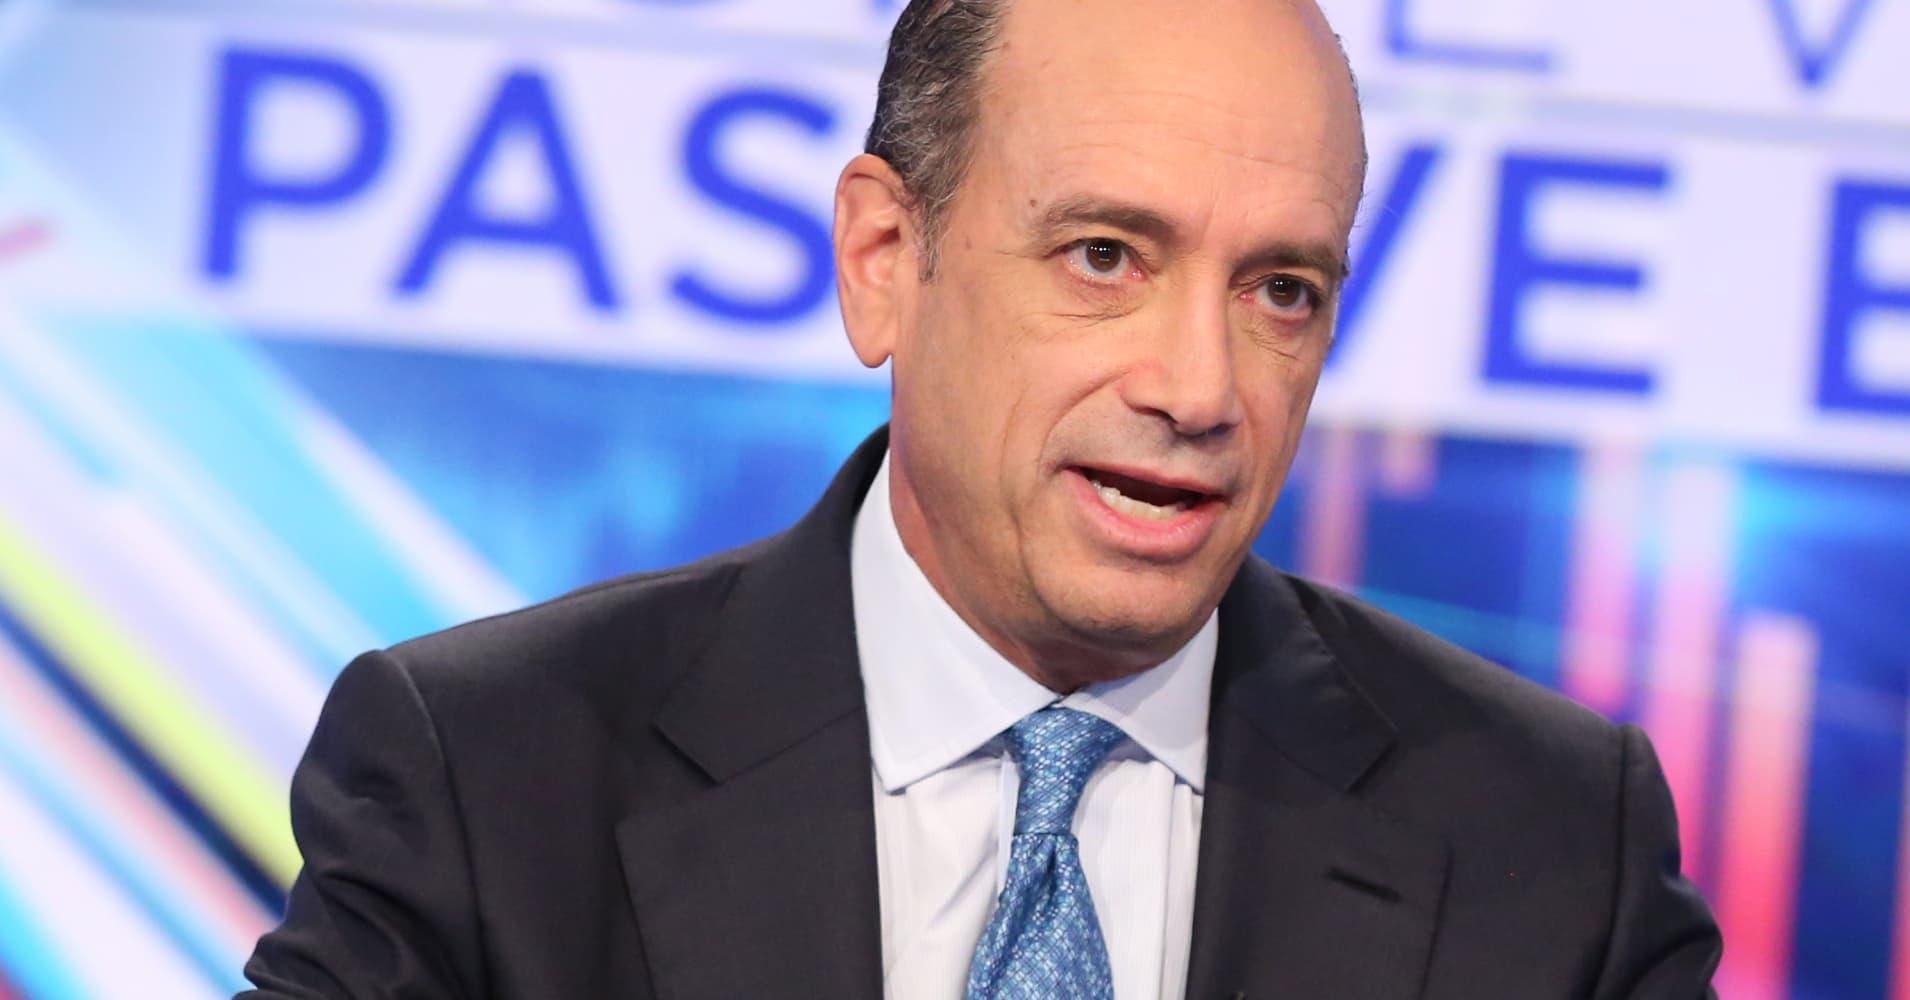 Value investor Joel Greenblatt says he likes Booking Holdings, thinks Align is too expensive